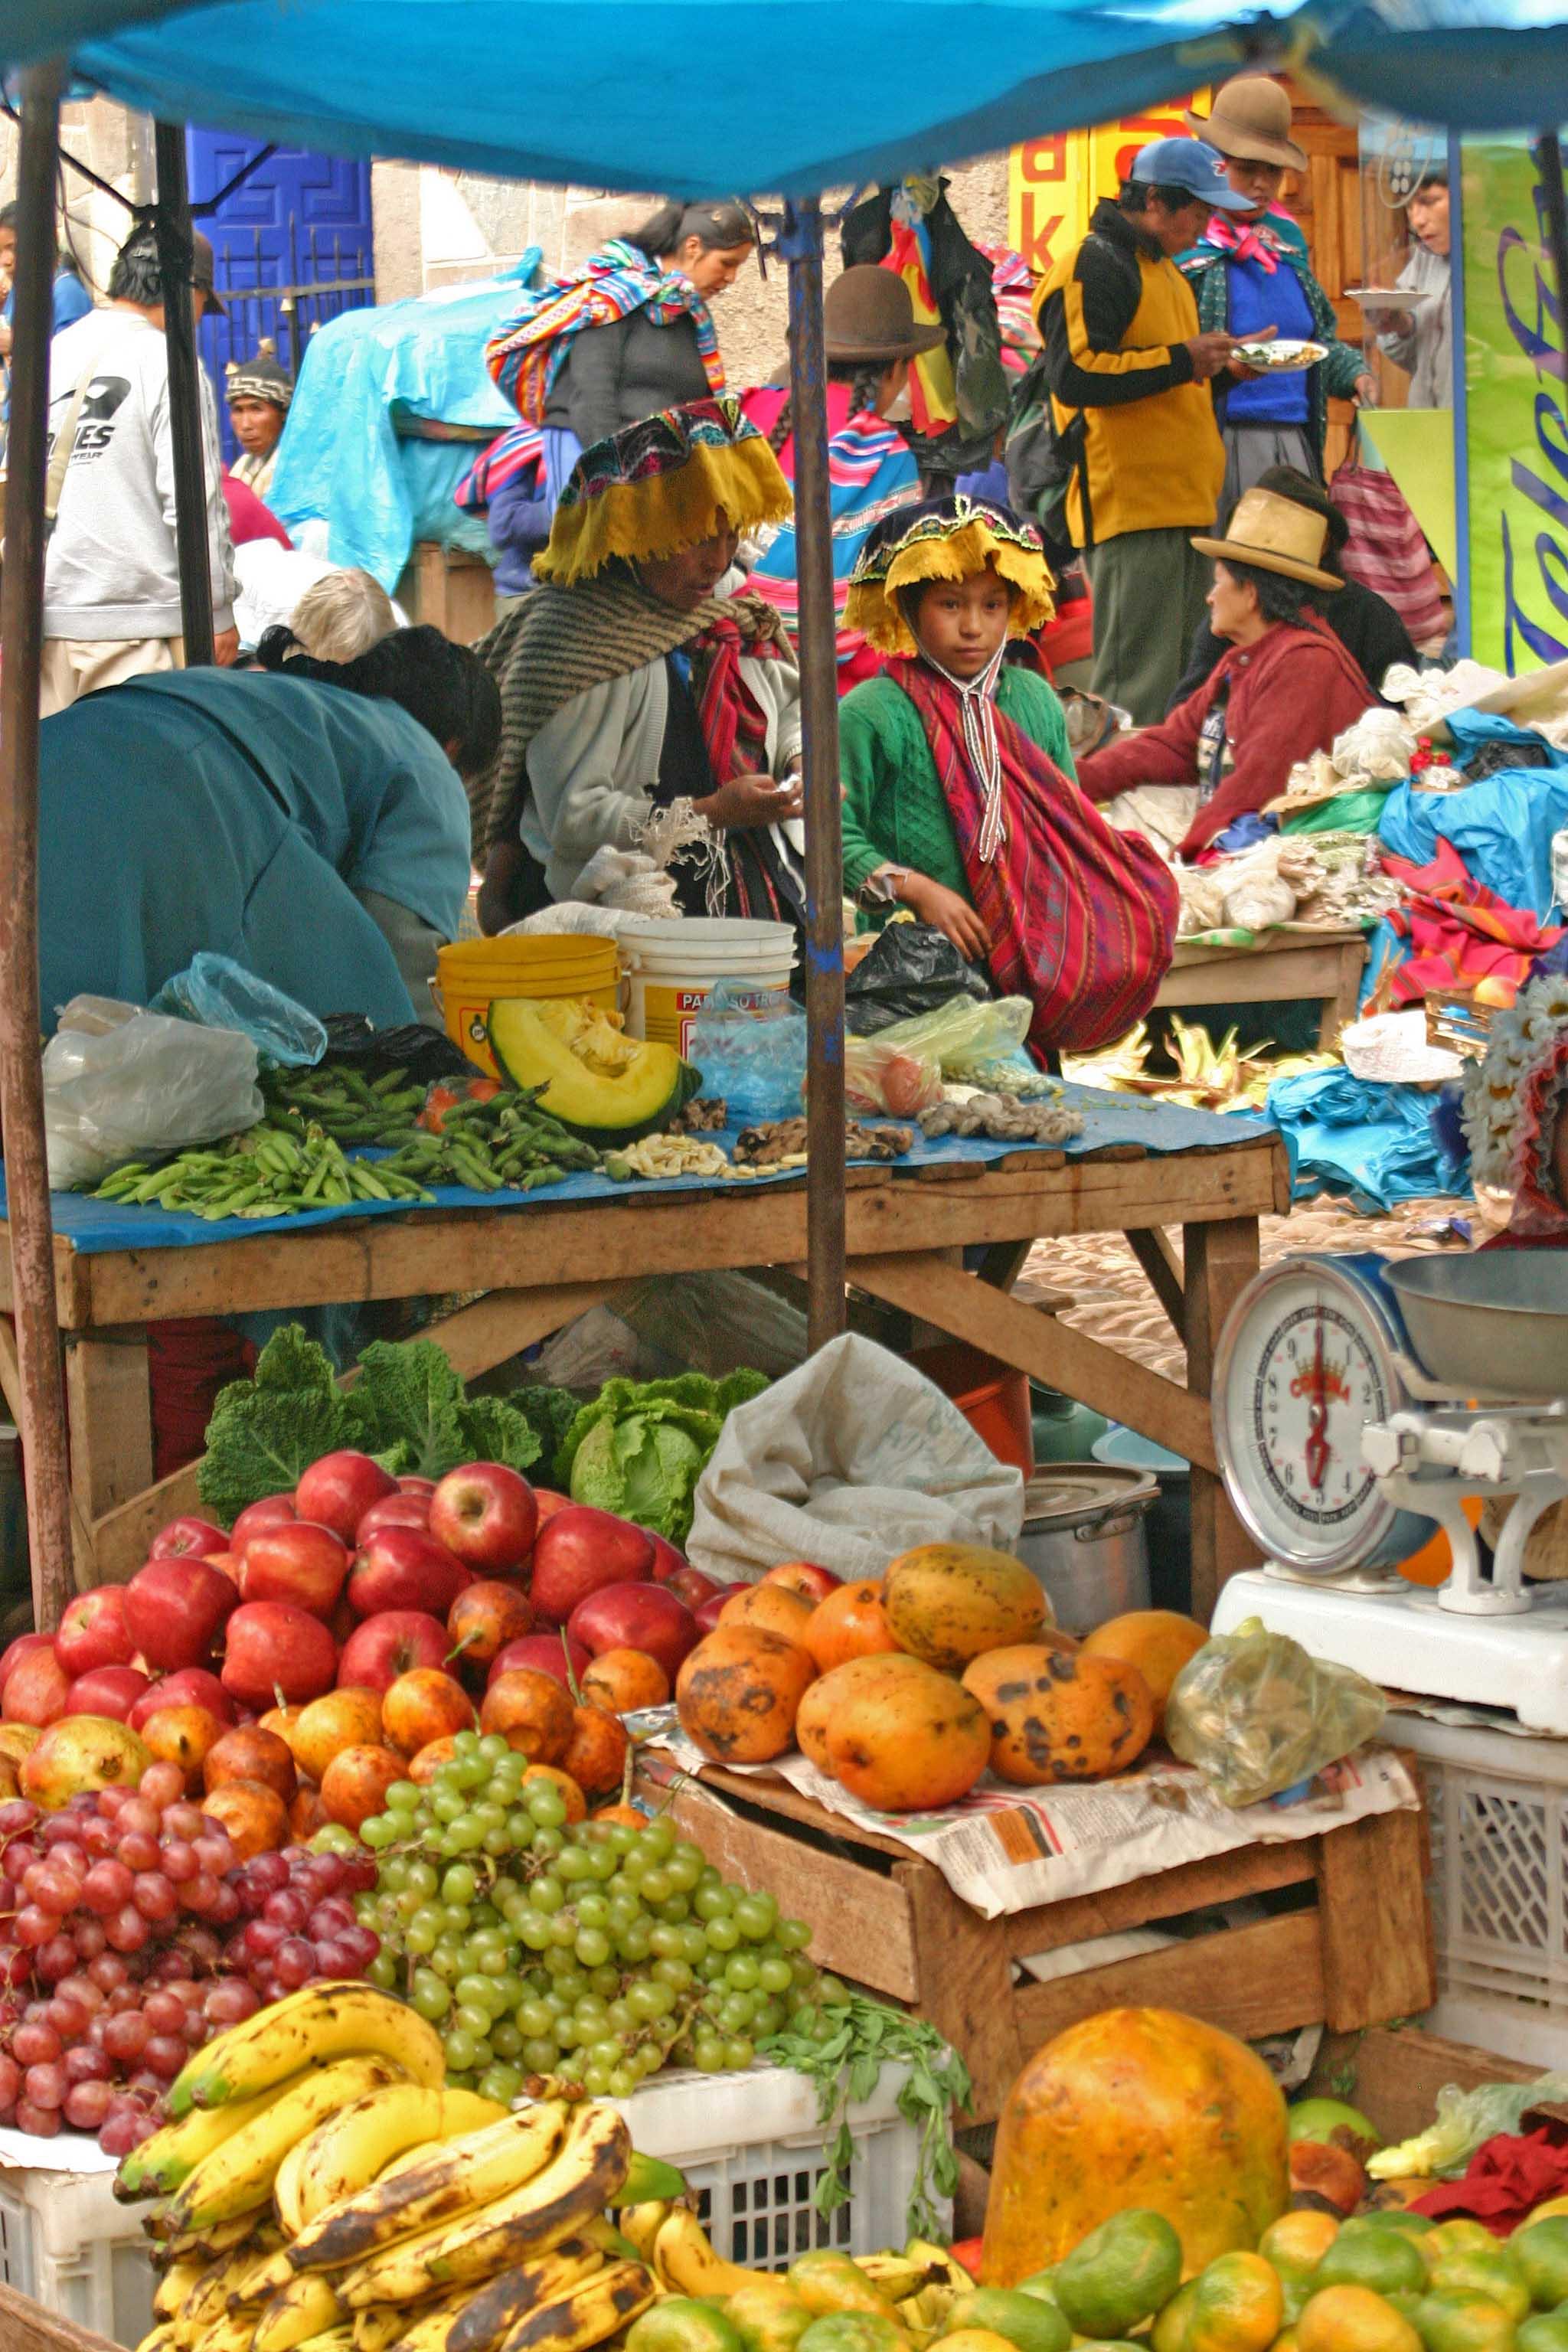 Peru Outdoor_market_at_Pisac_Andes_Mts_Peru_image_1_copy